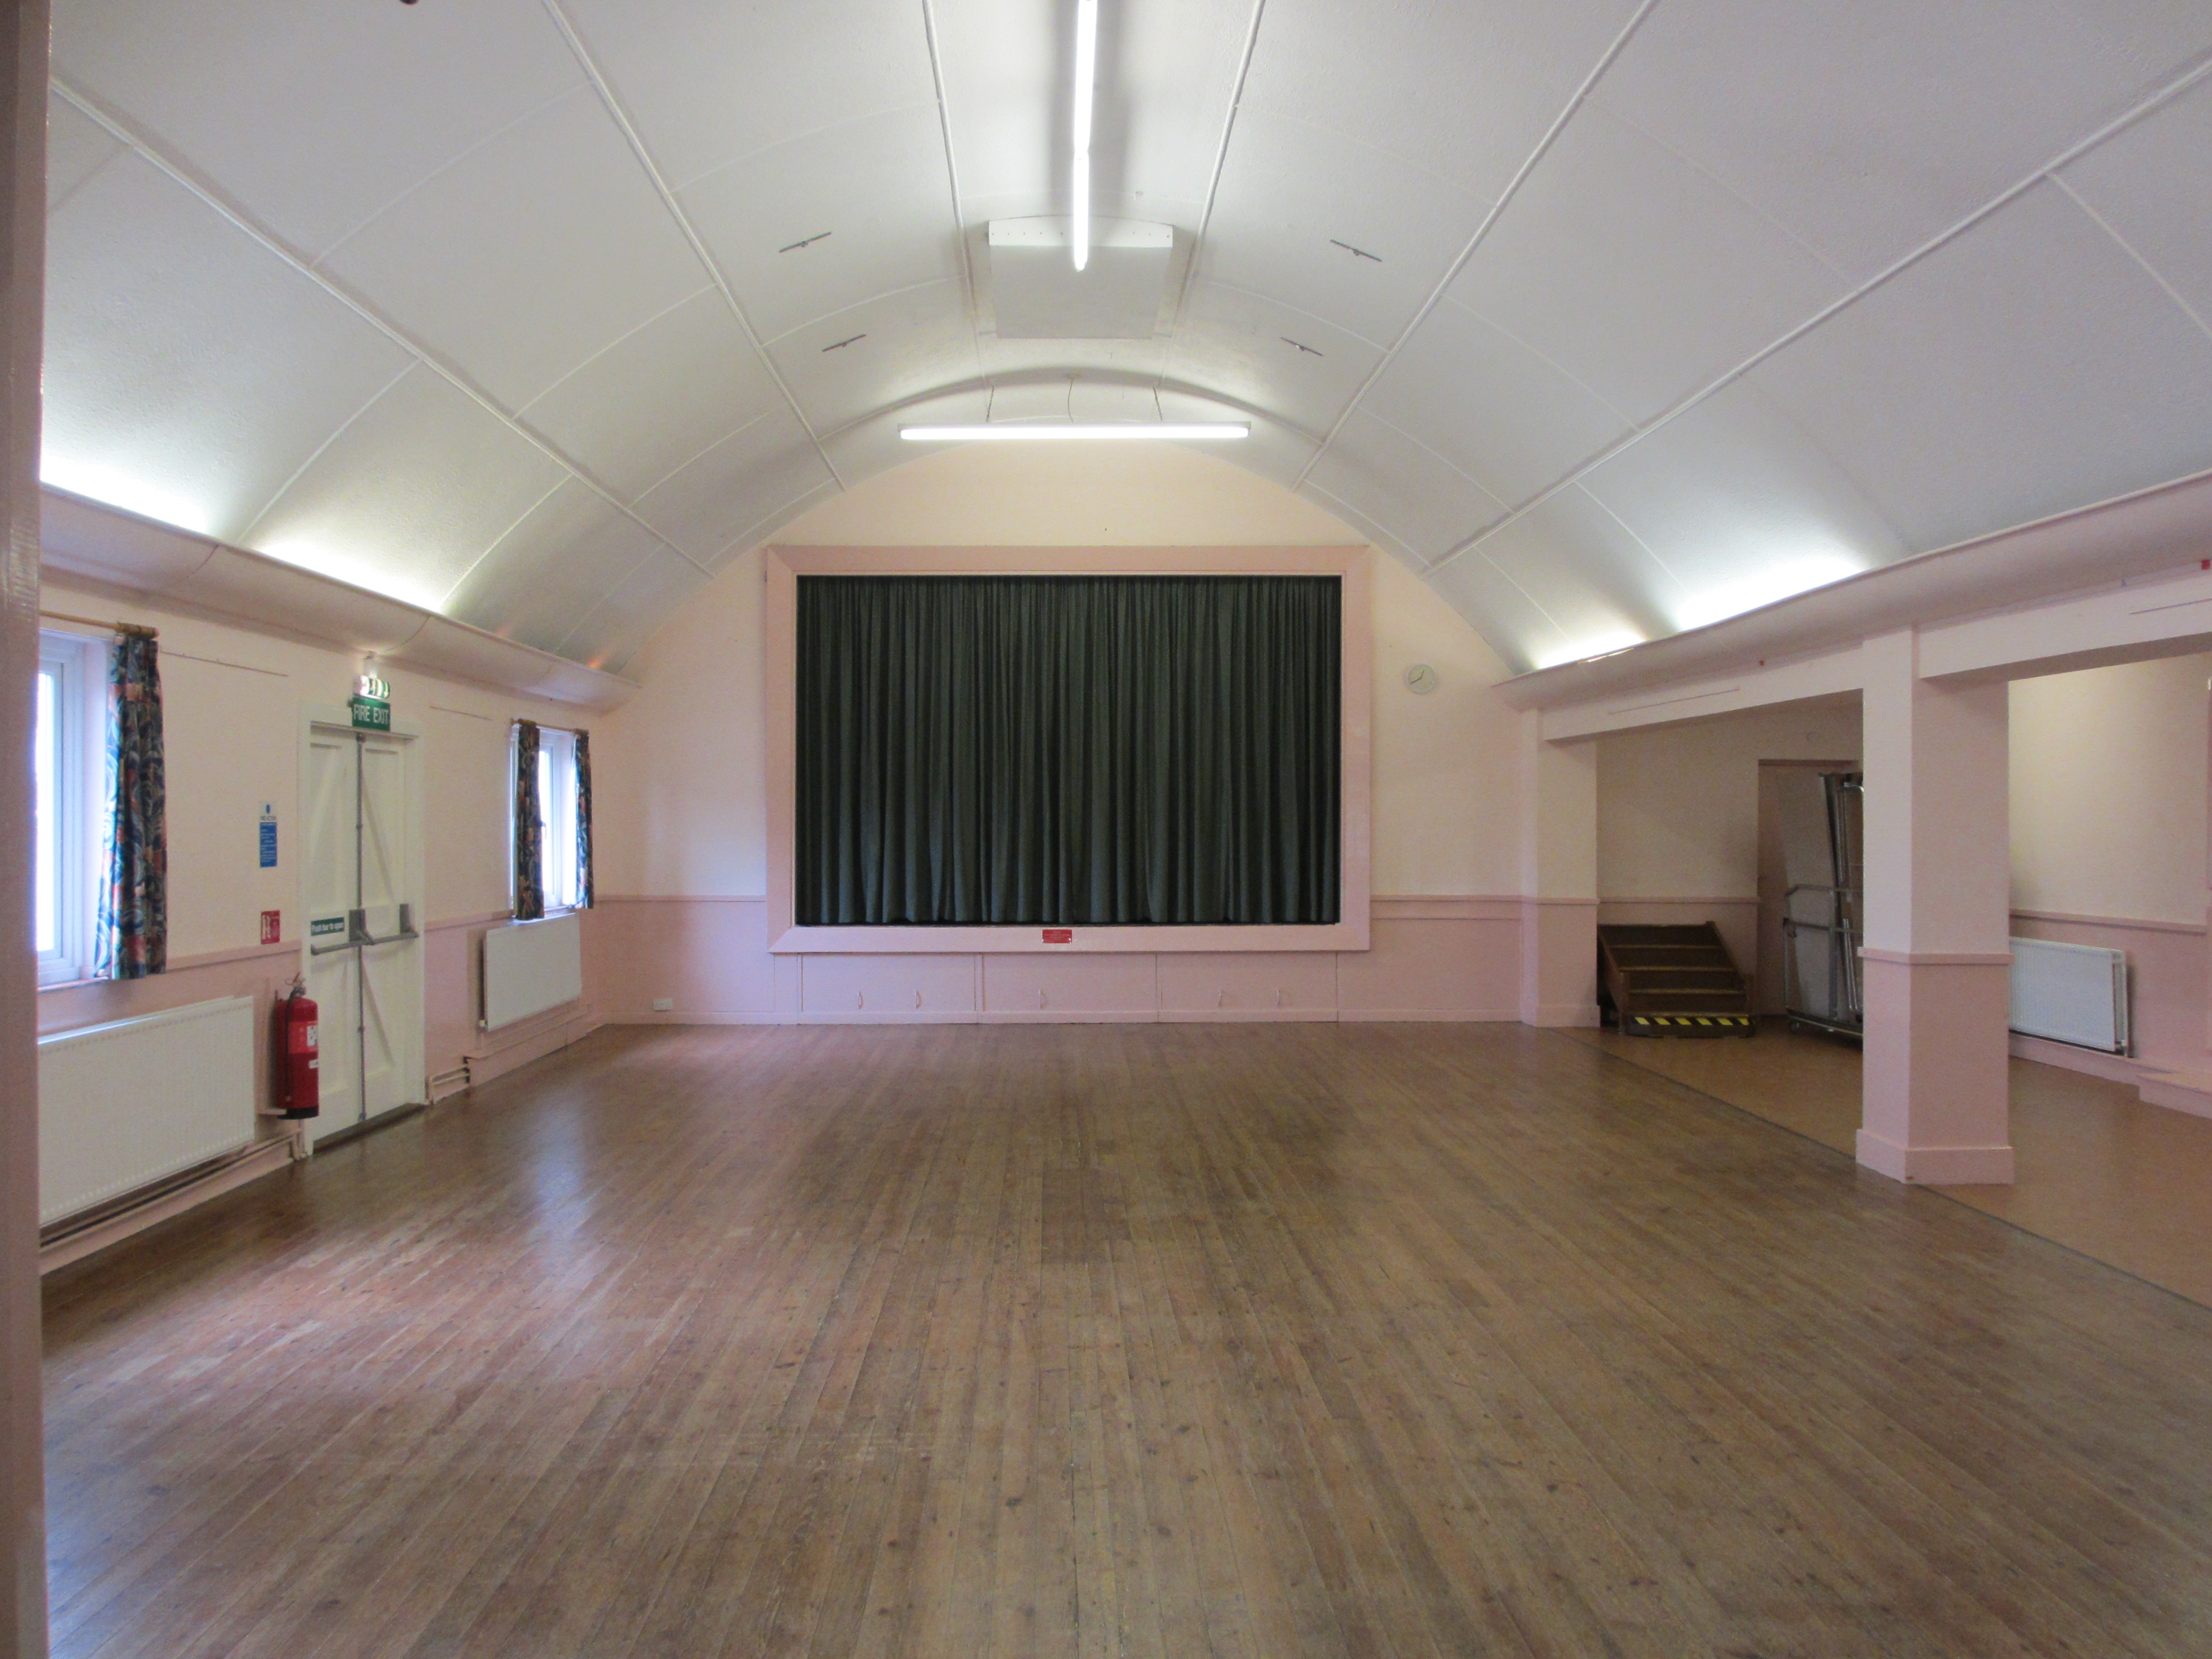 Alderbury Village Hall